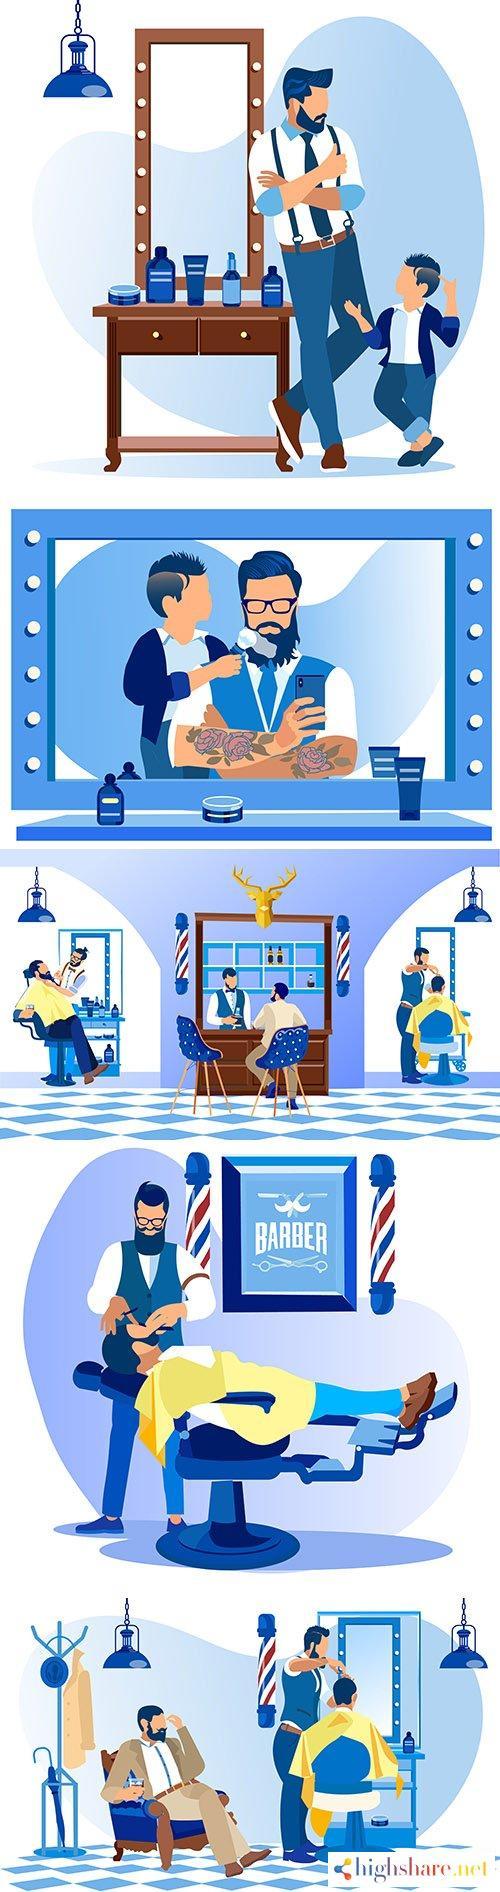 professional beauty salon men s hair salon illustration 5f409659d44a0 - Professional beauty salon, men 's hair salon illustration